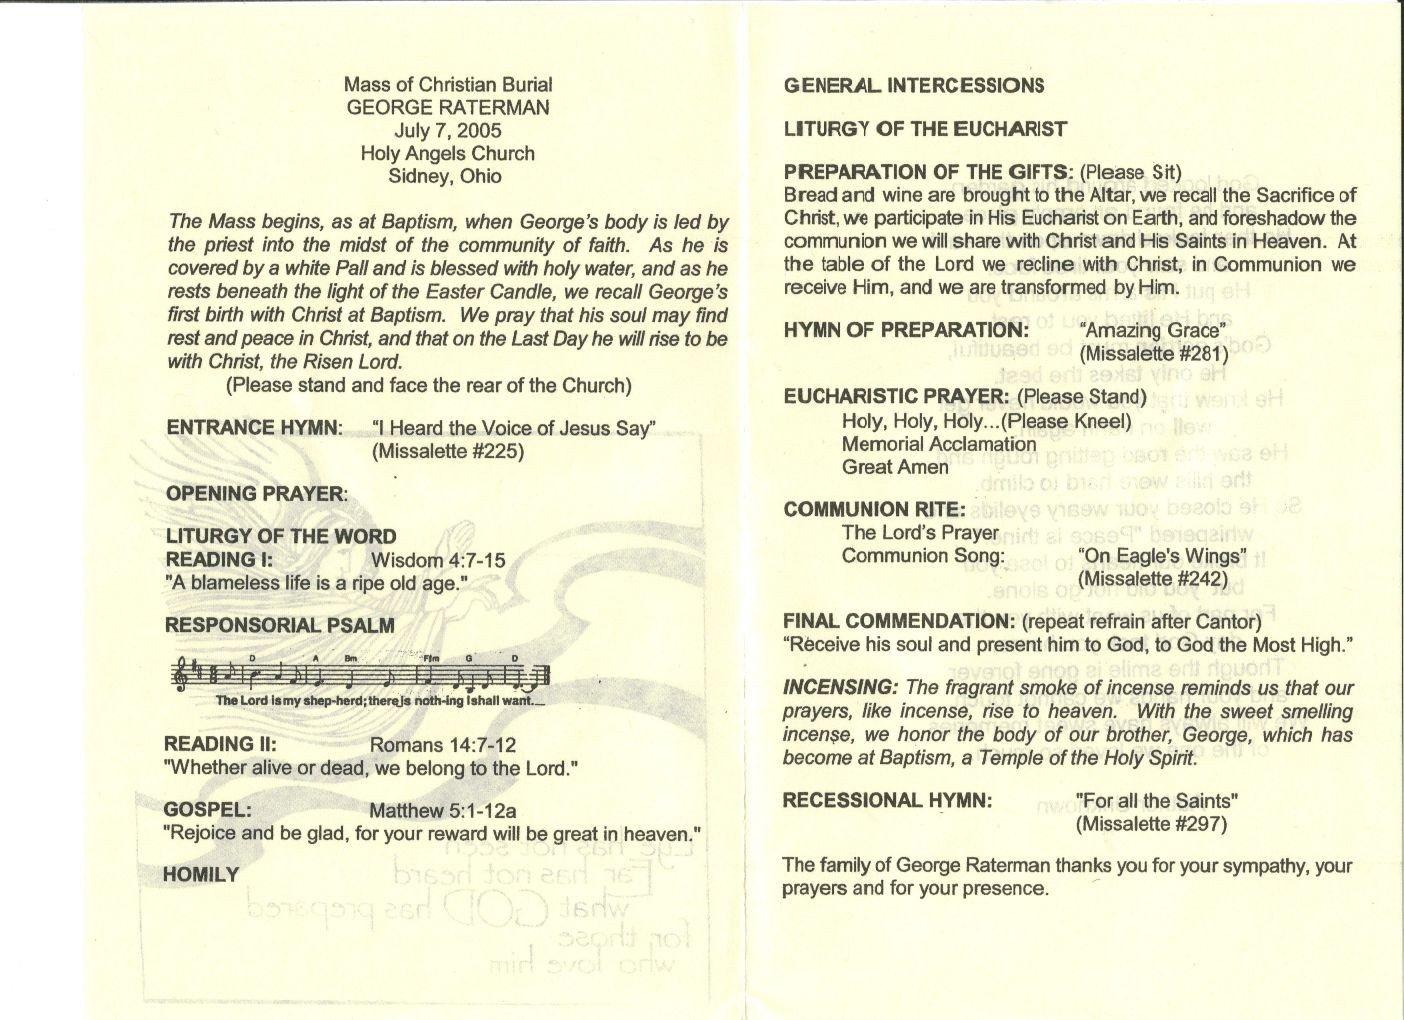 Funeral Mass Program Template How to Write Catholic Mass Program Funeral